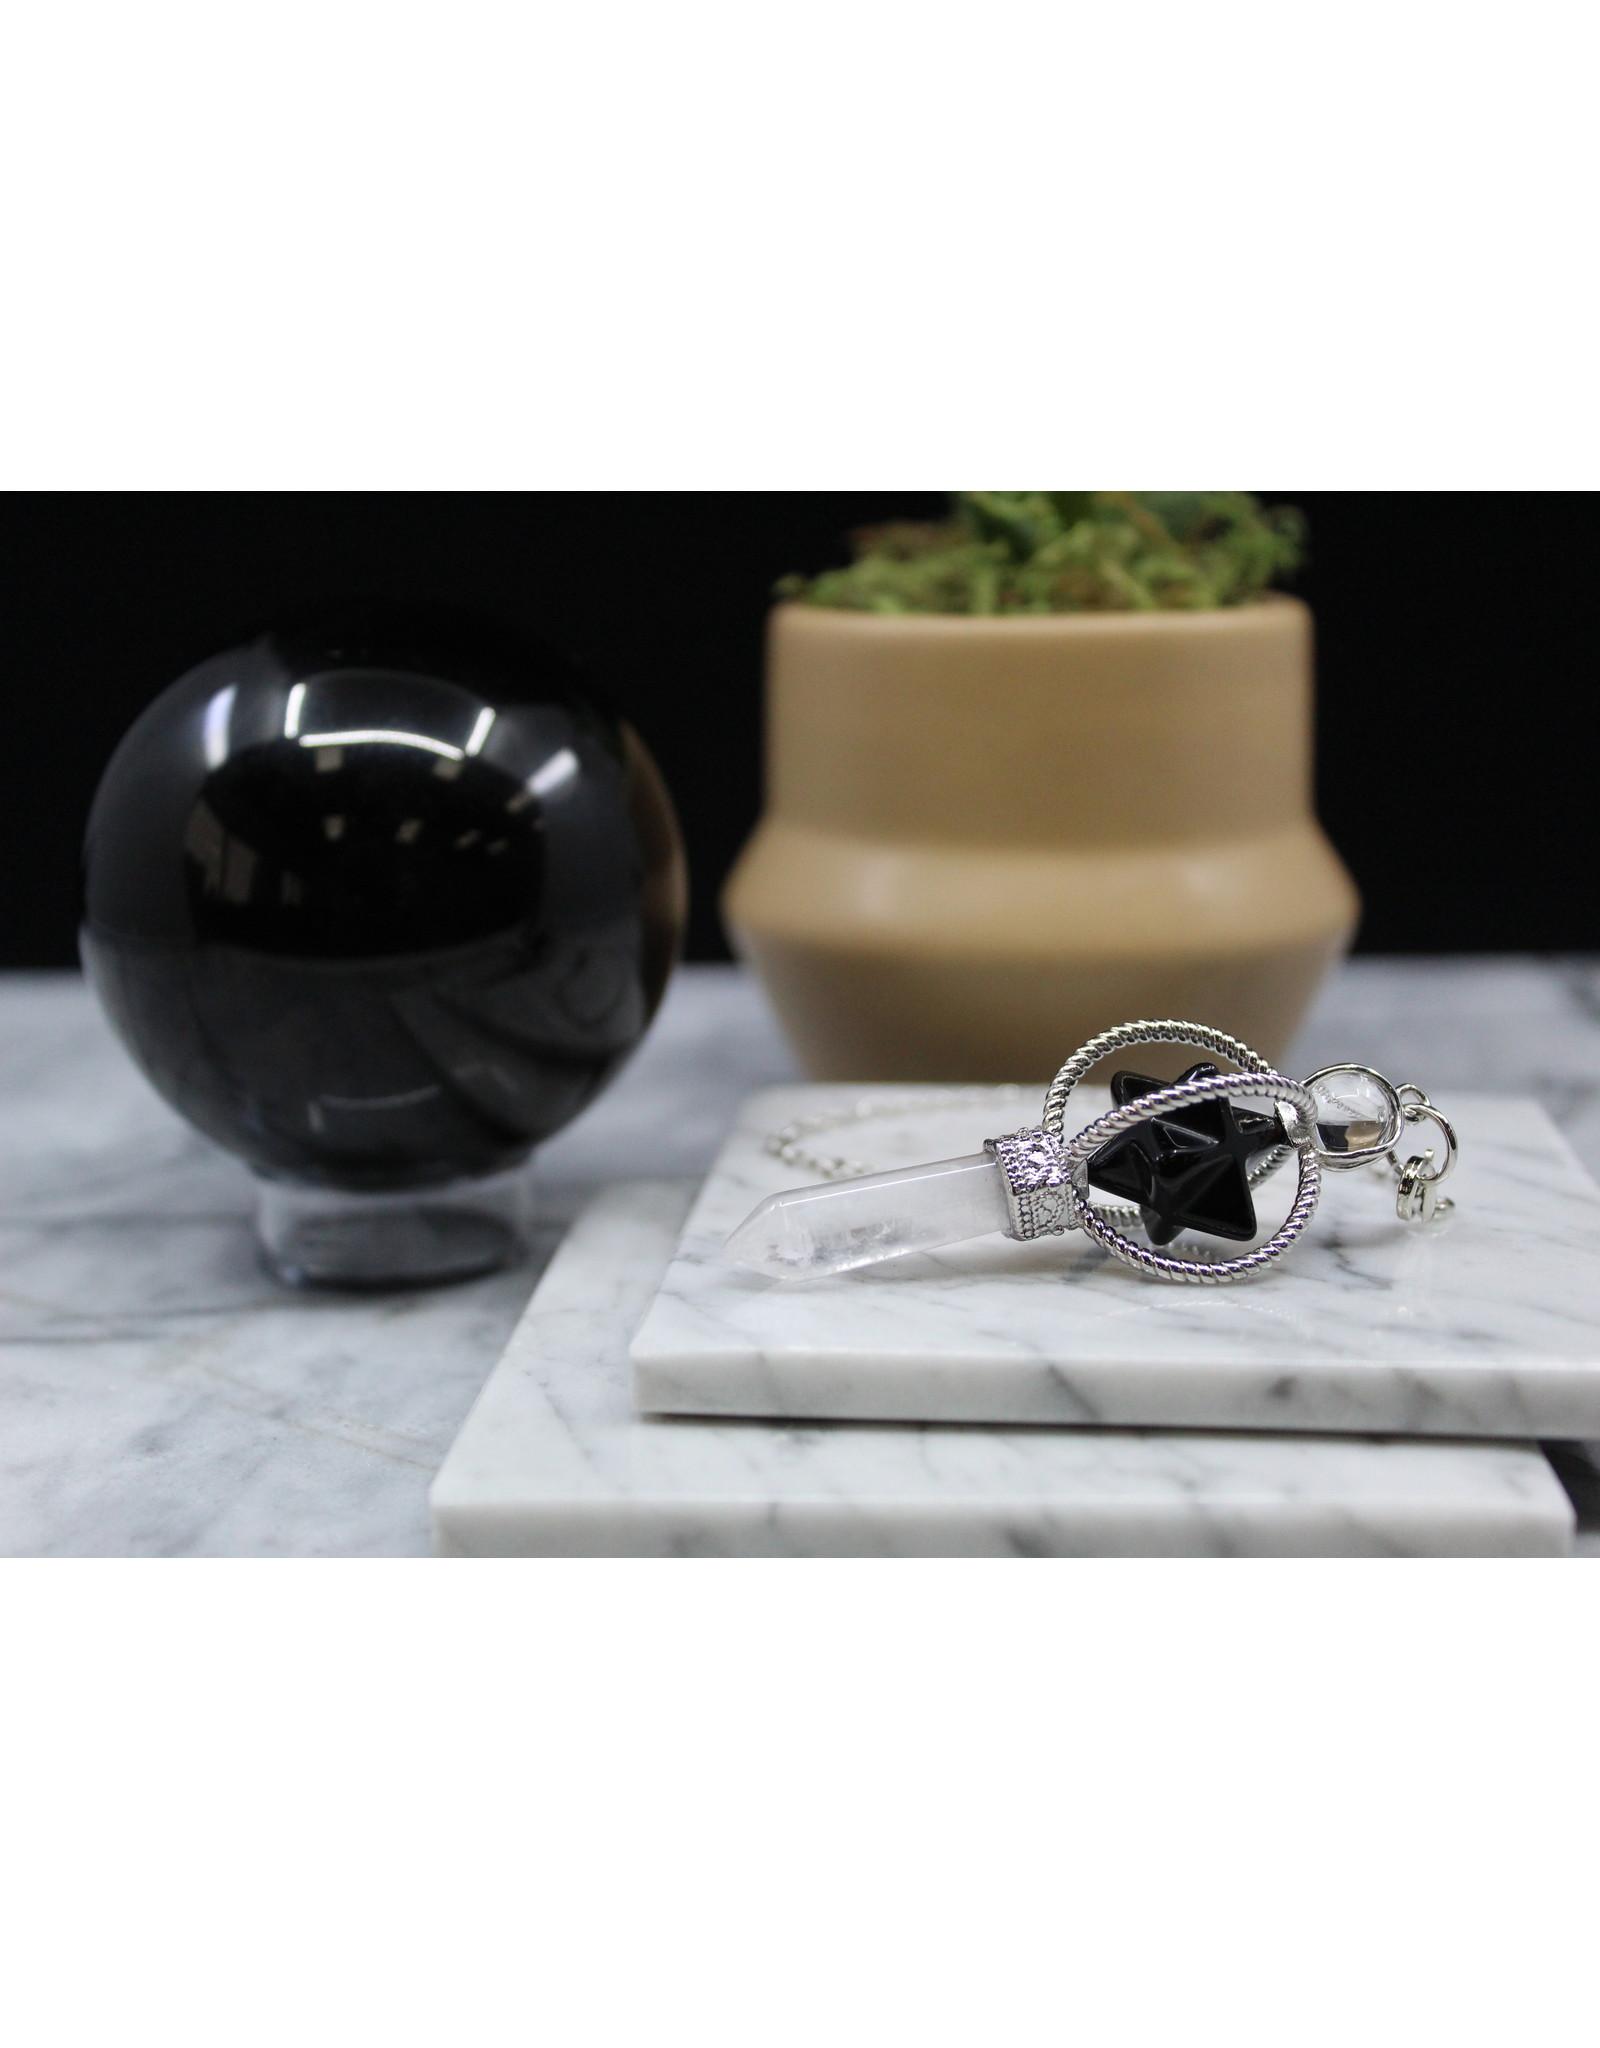 Spinning Merkaba w/ Clear Quartz Point Pendulum-Black Obsidian